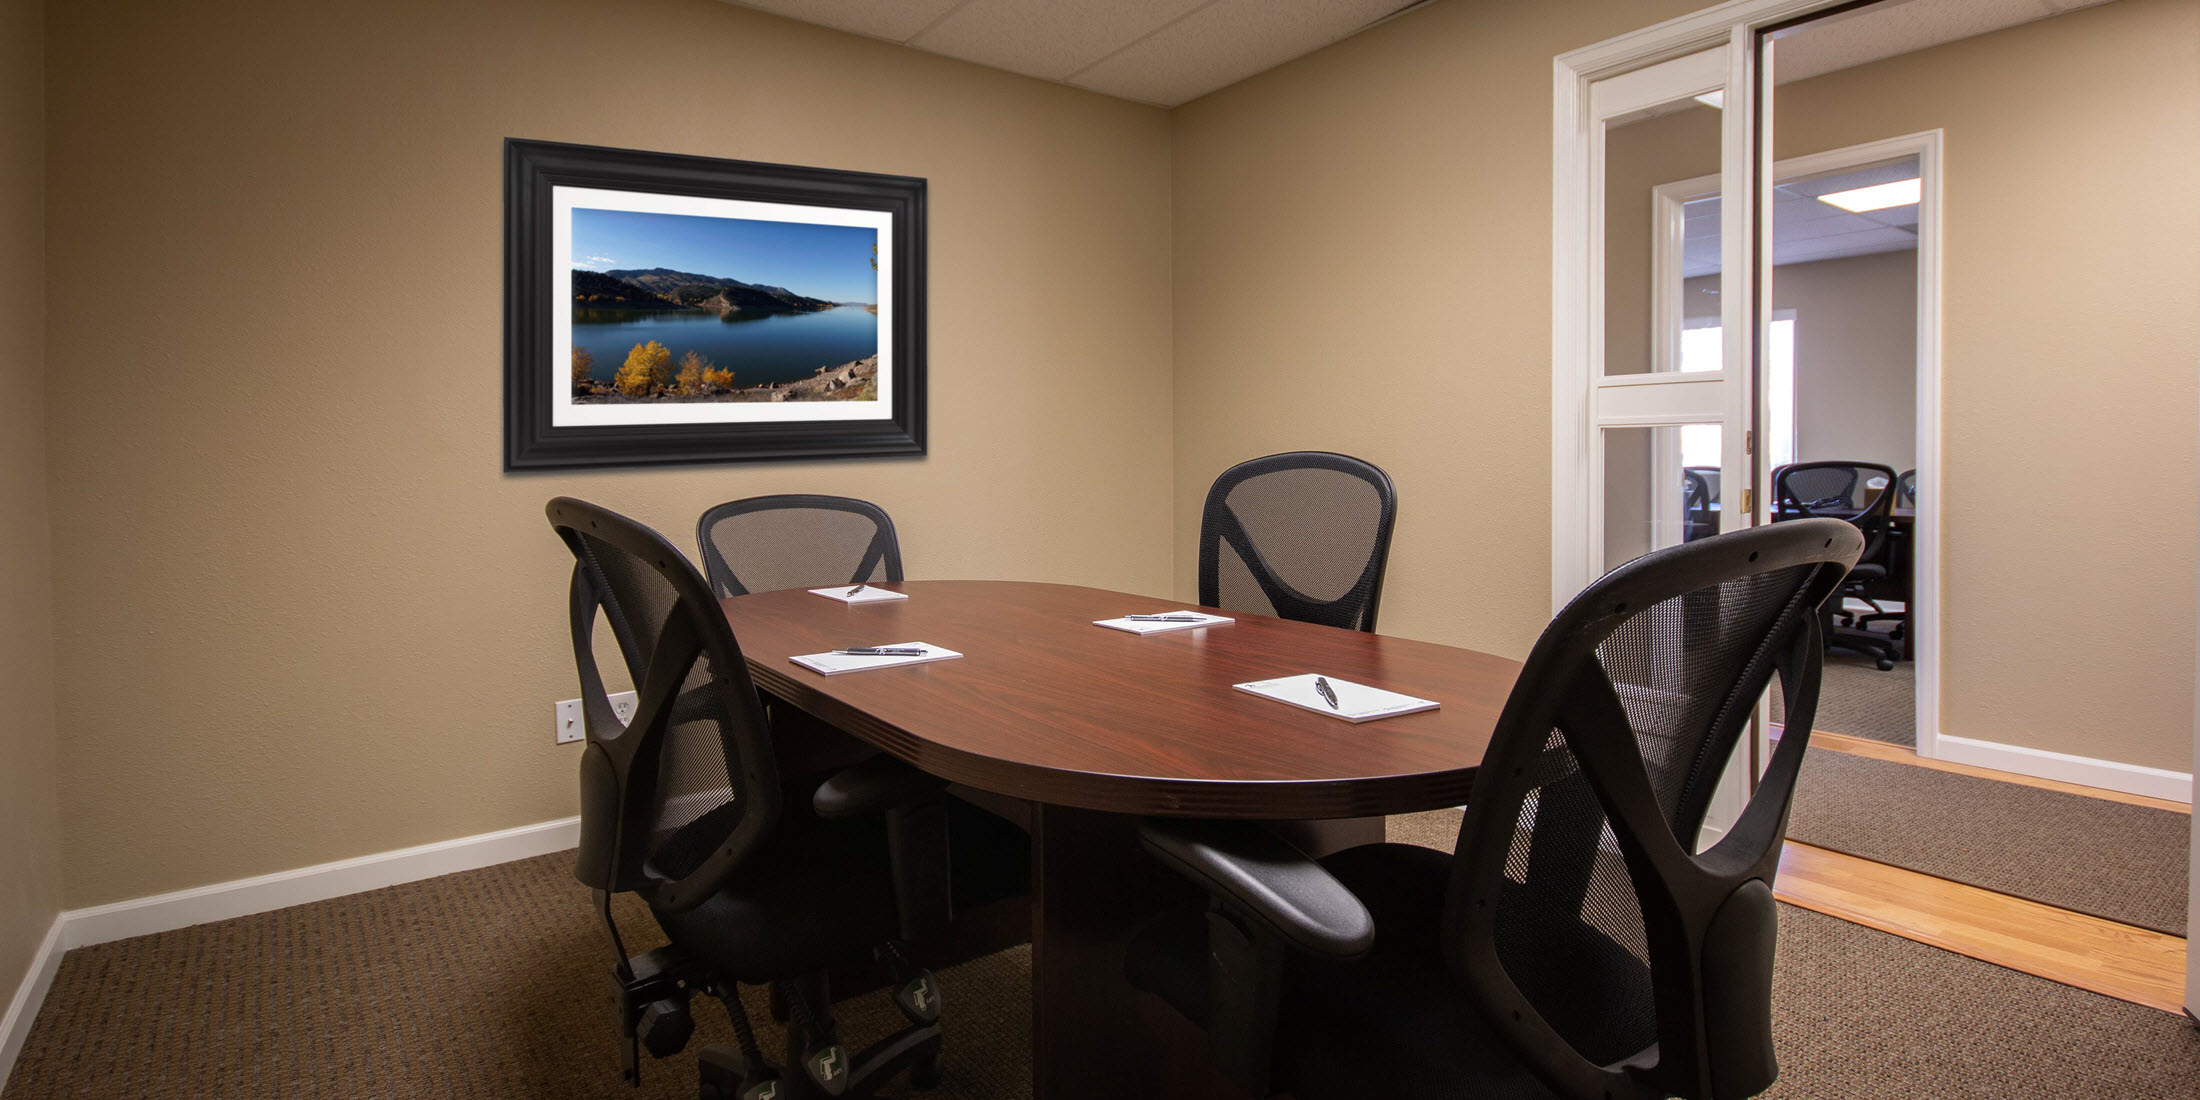 Cache La Poudre Suite Fort Collins Meeting Rooms at Meadors